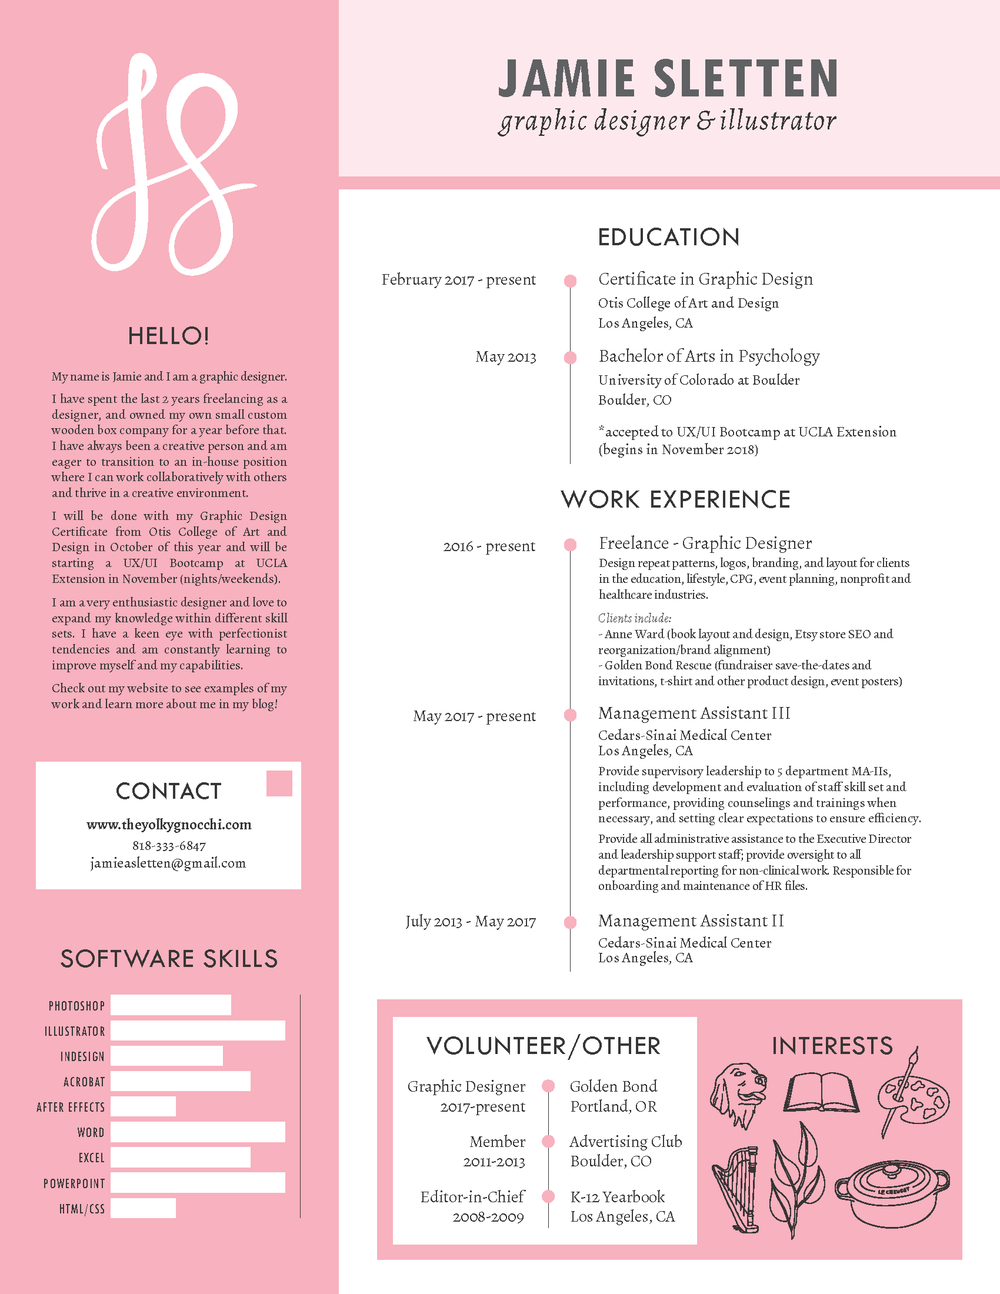 Resume_Jamie Sletten_8_2018.png